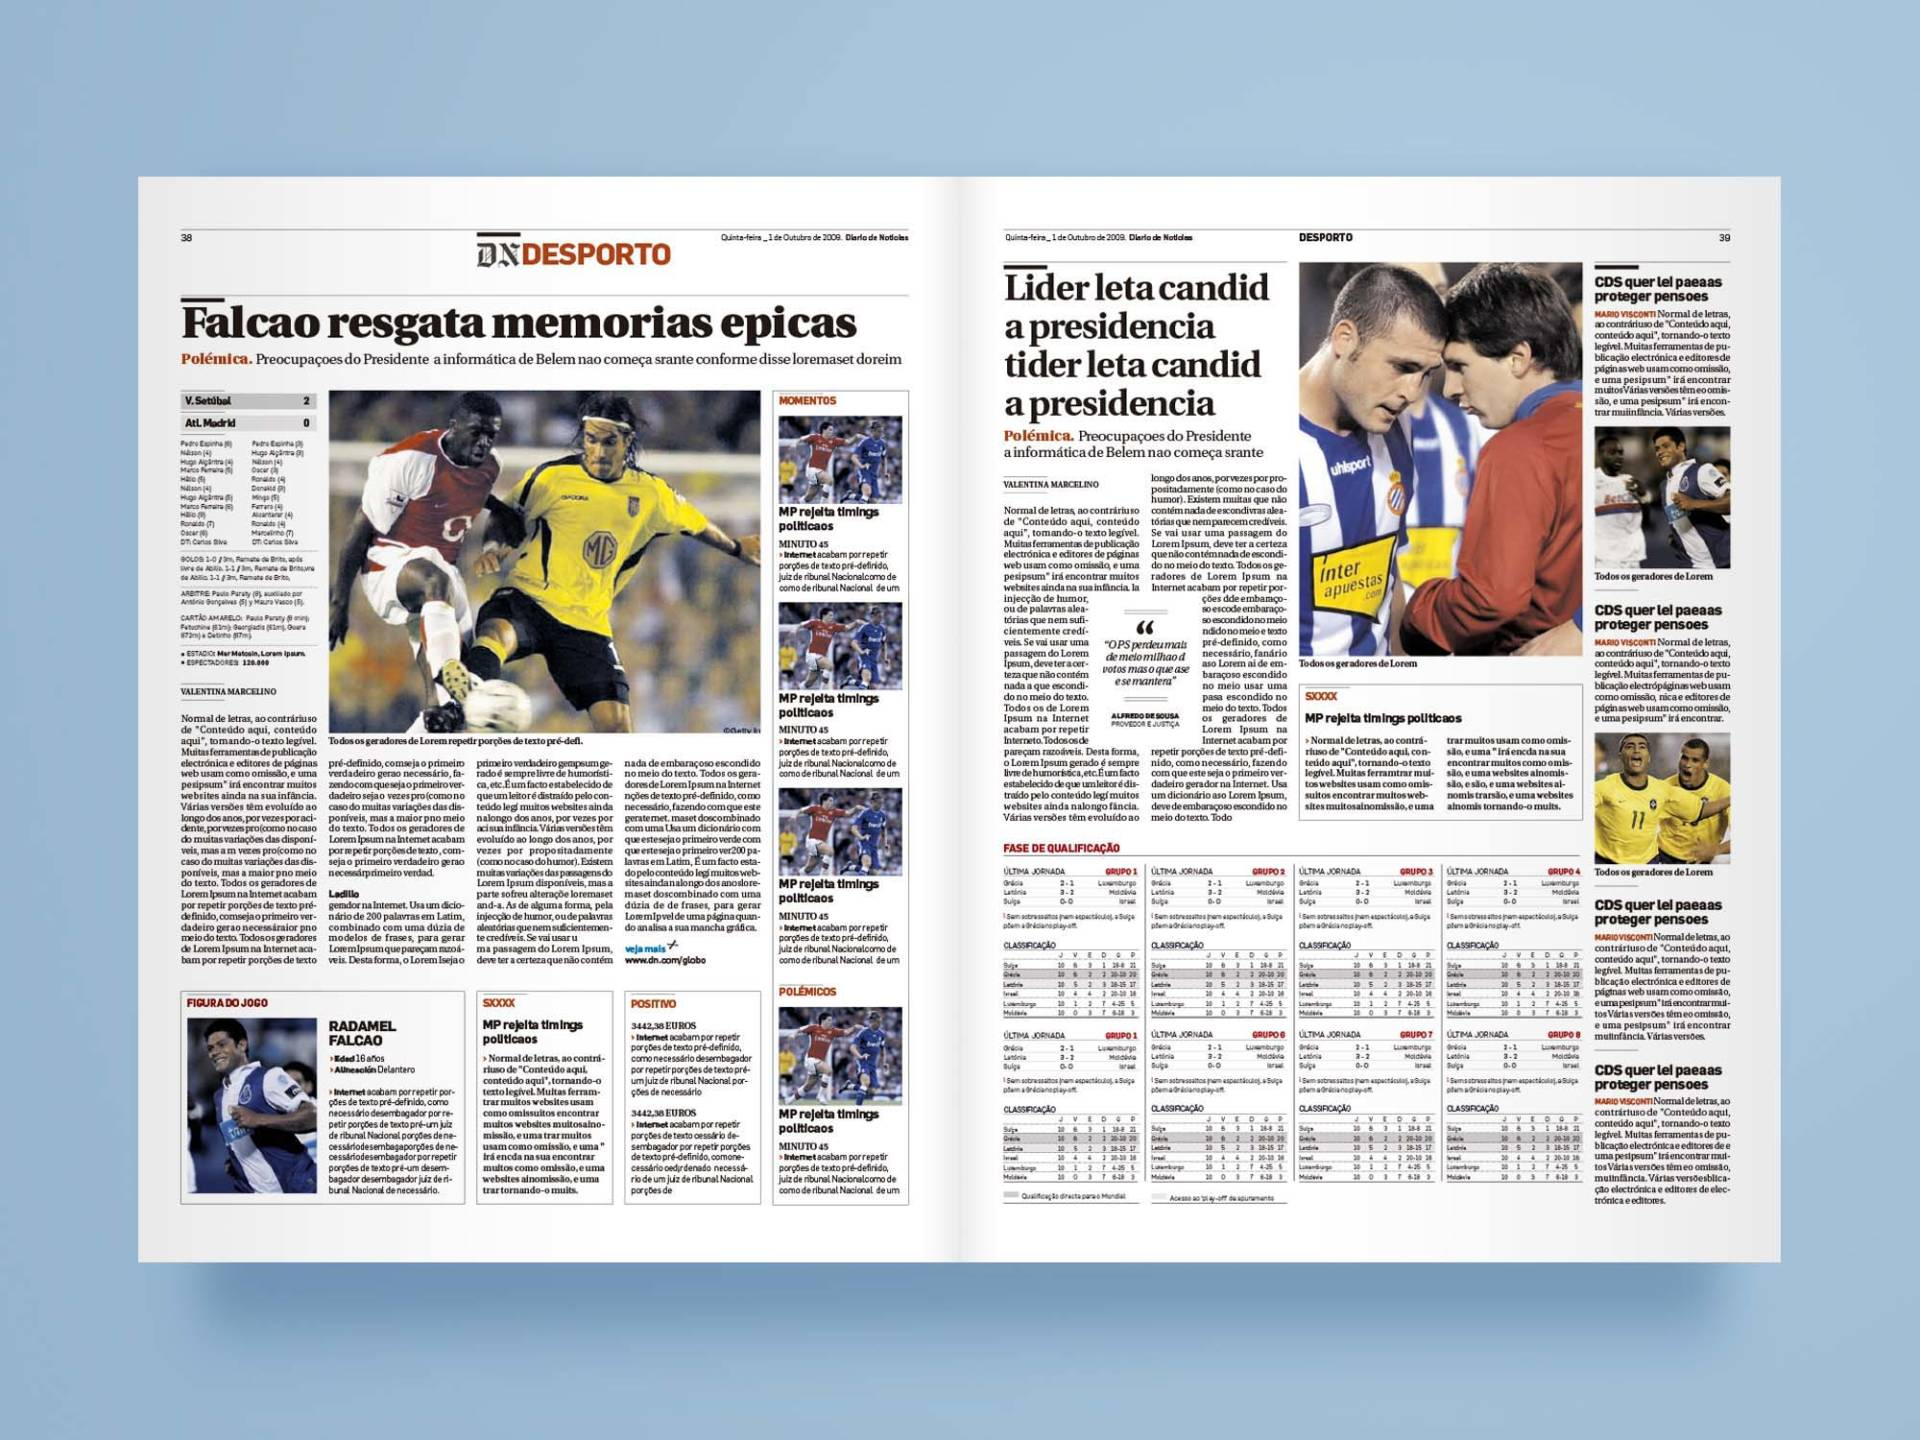 Diario_De_Noticias_05_Wenceslau_News_Design